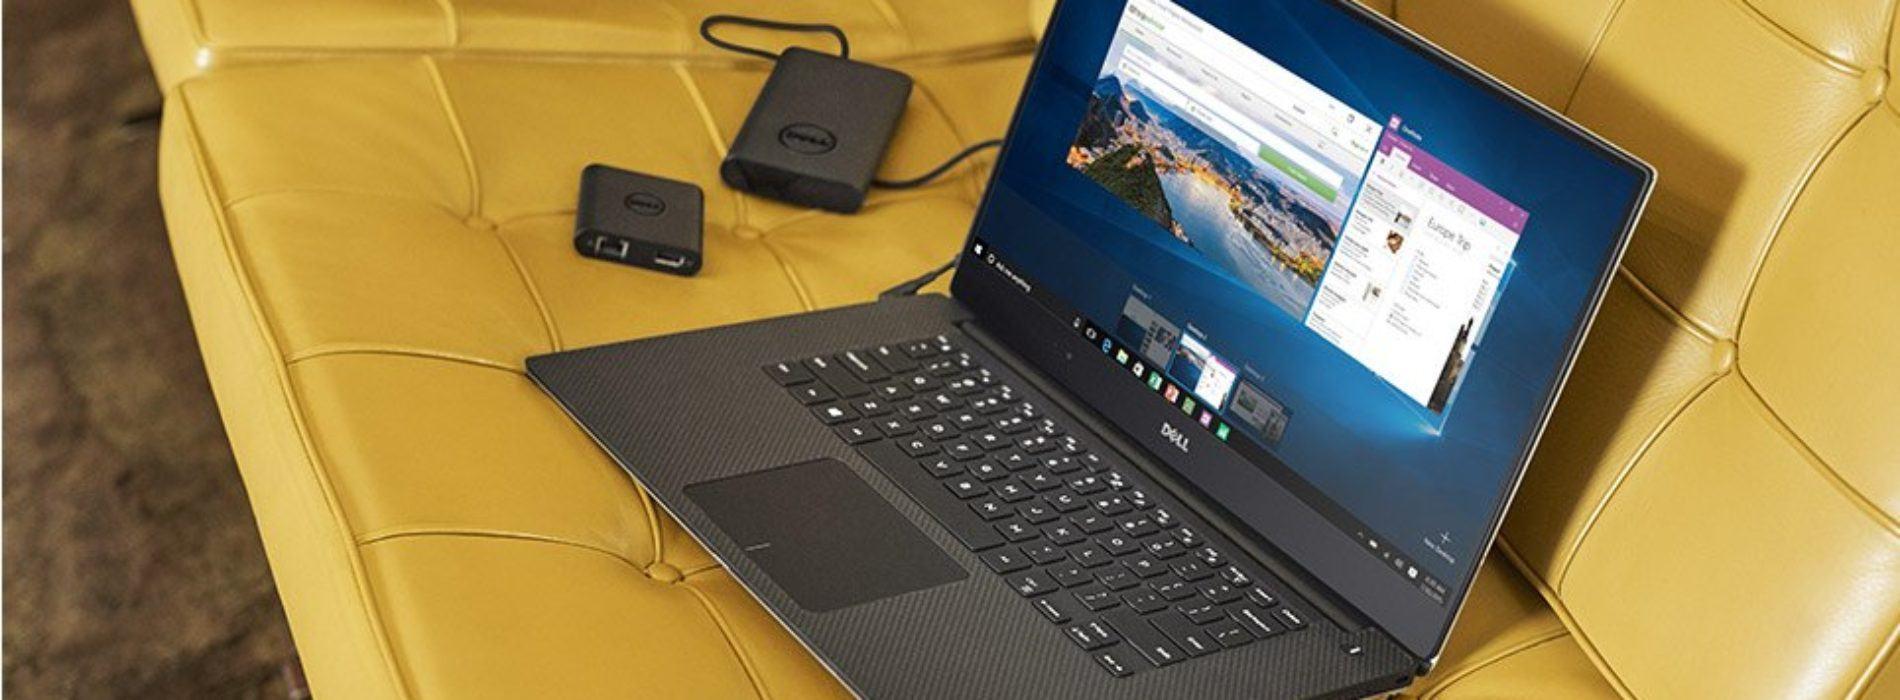 El primer portátil en usar Nvidia GeForce GTX 1050 será el Dell XPS 15